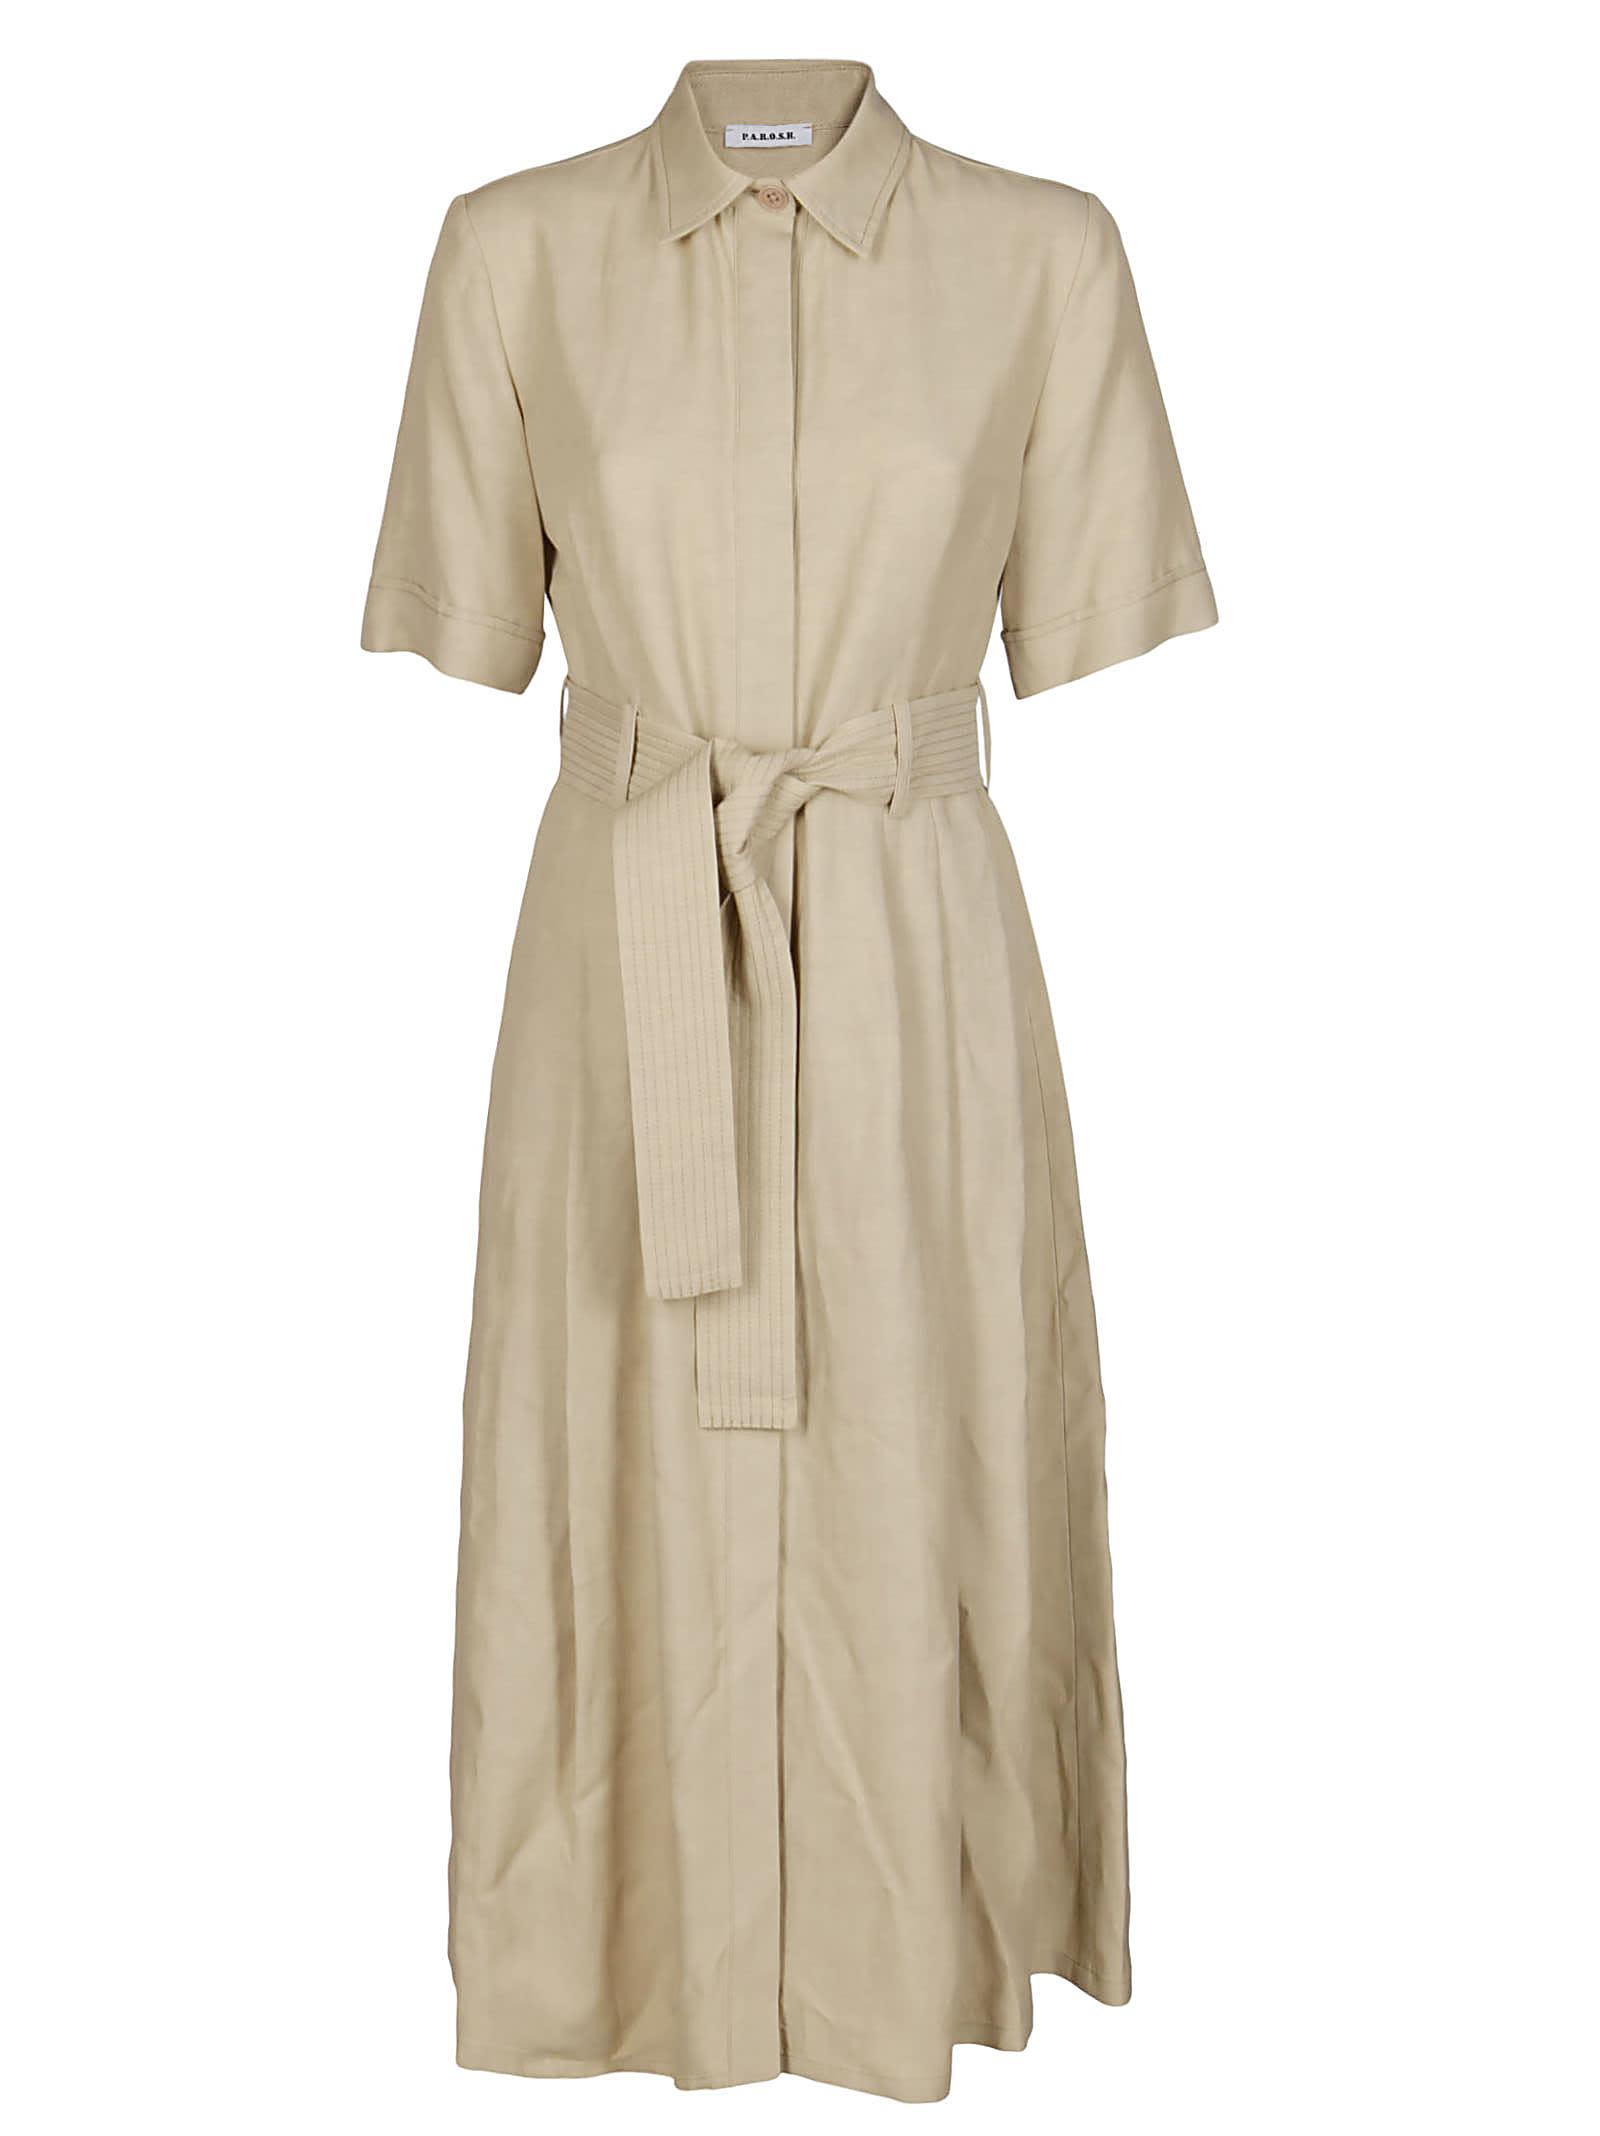 Buy Beige Viscose-linen Blend Dress online, shop Parosh with free shipping